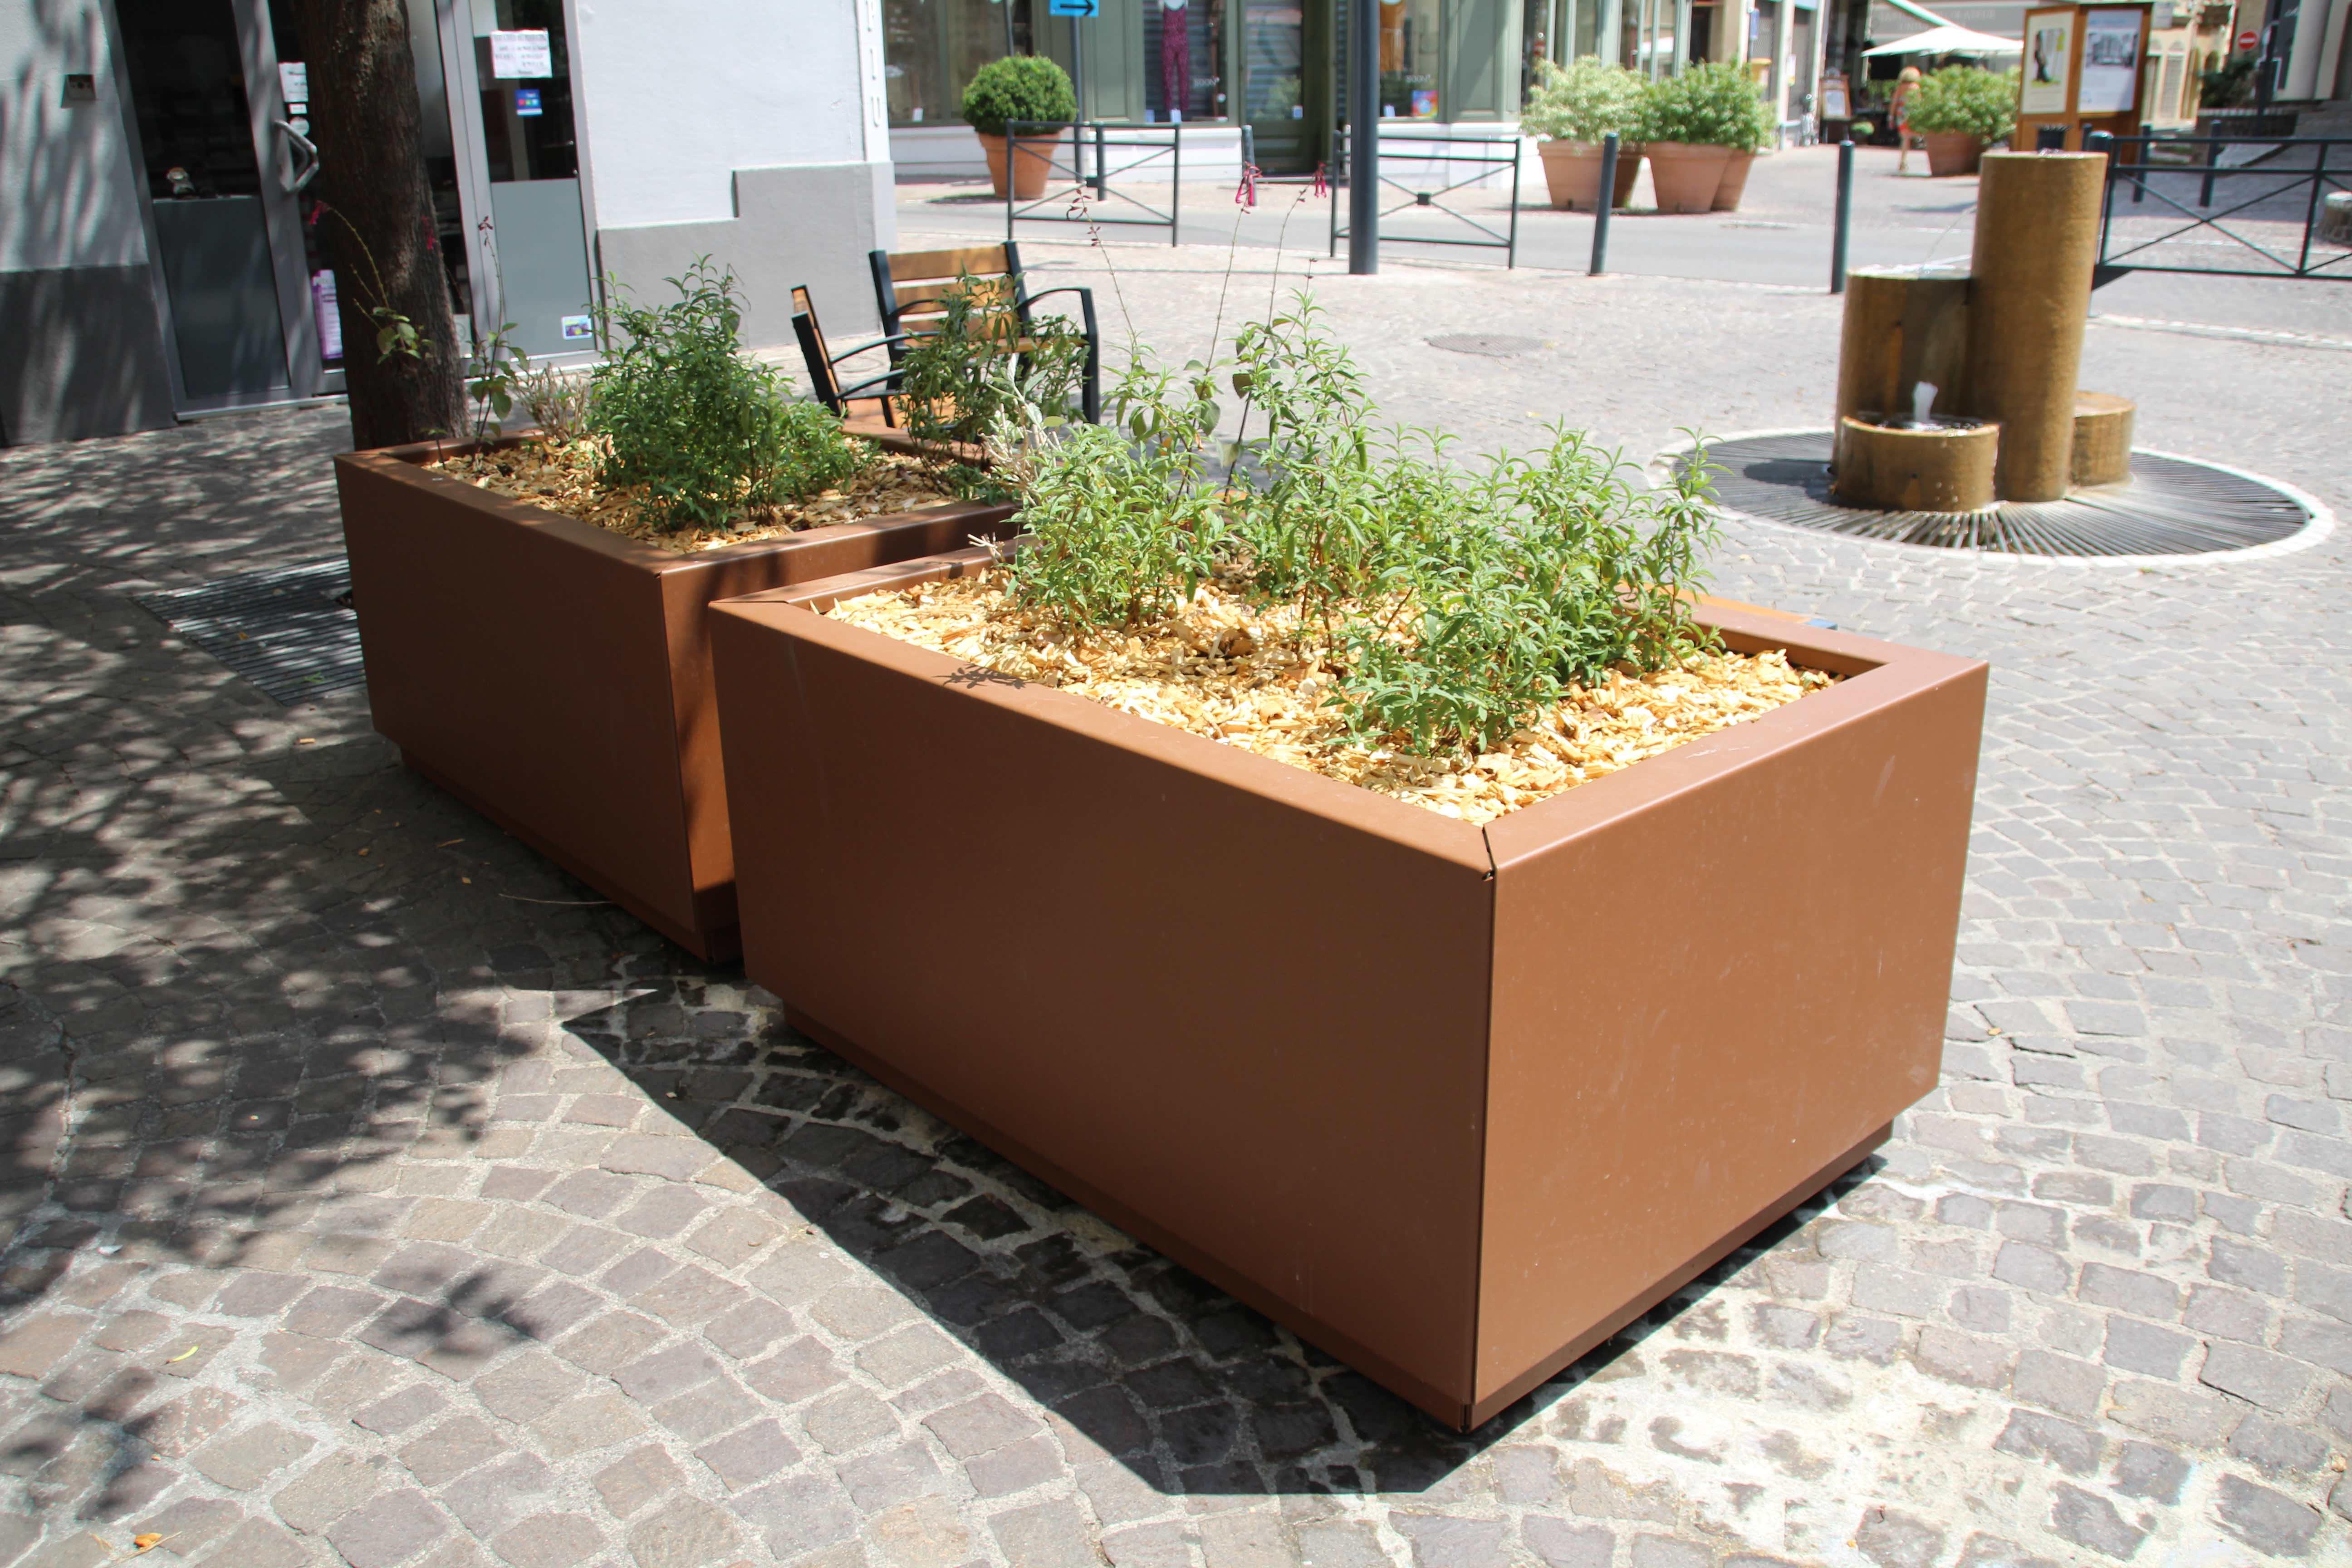 Mobilier urbain fabricant fran ais de mobilier urbain for Espace vert urbain